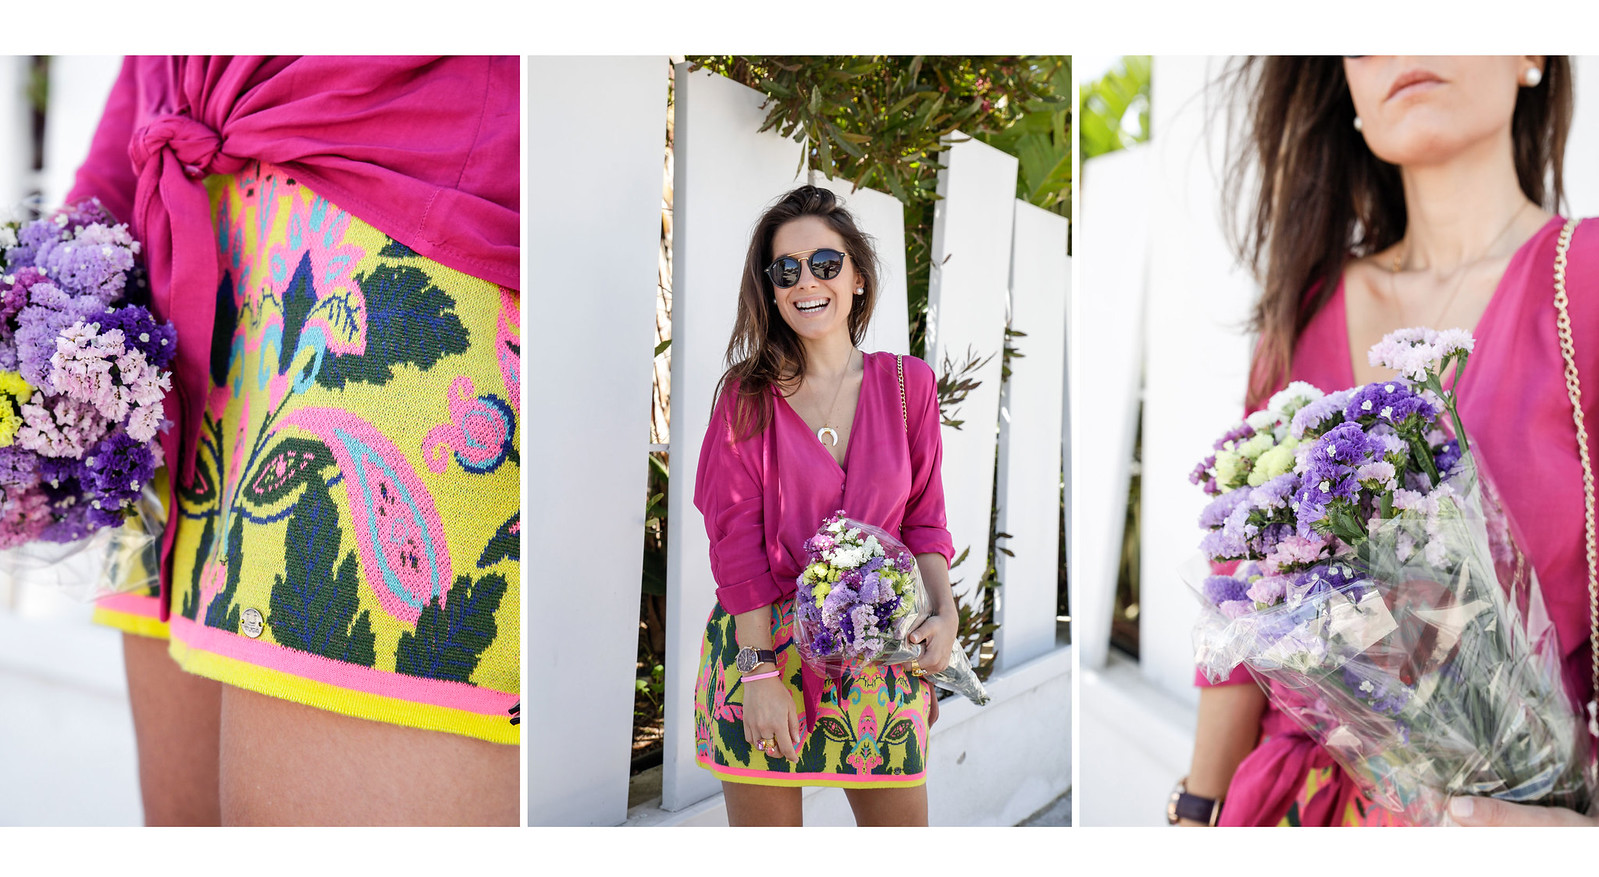 04_blusa_magenta_falda_amarilla_outfit_ruga_summer17_theguestgirl_influencer_barcelona_portugal_brand_ambassador